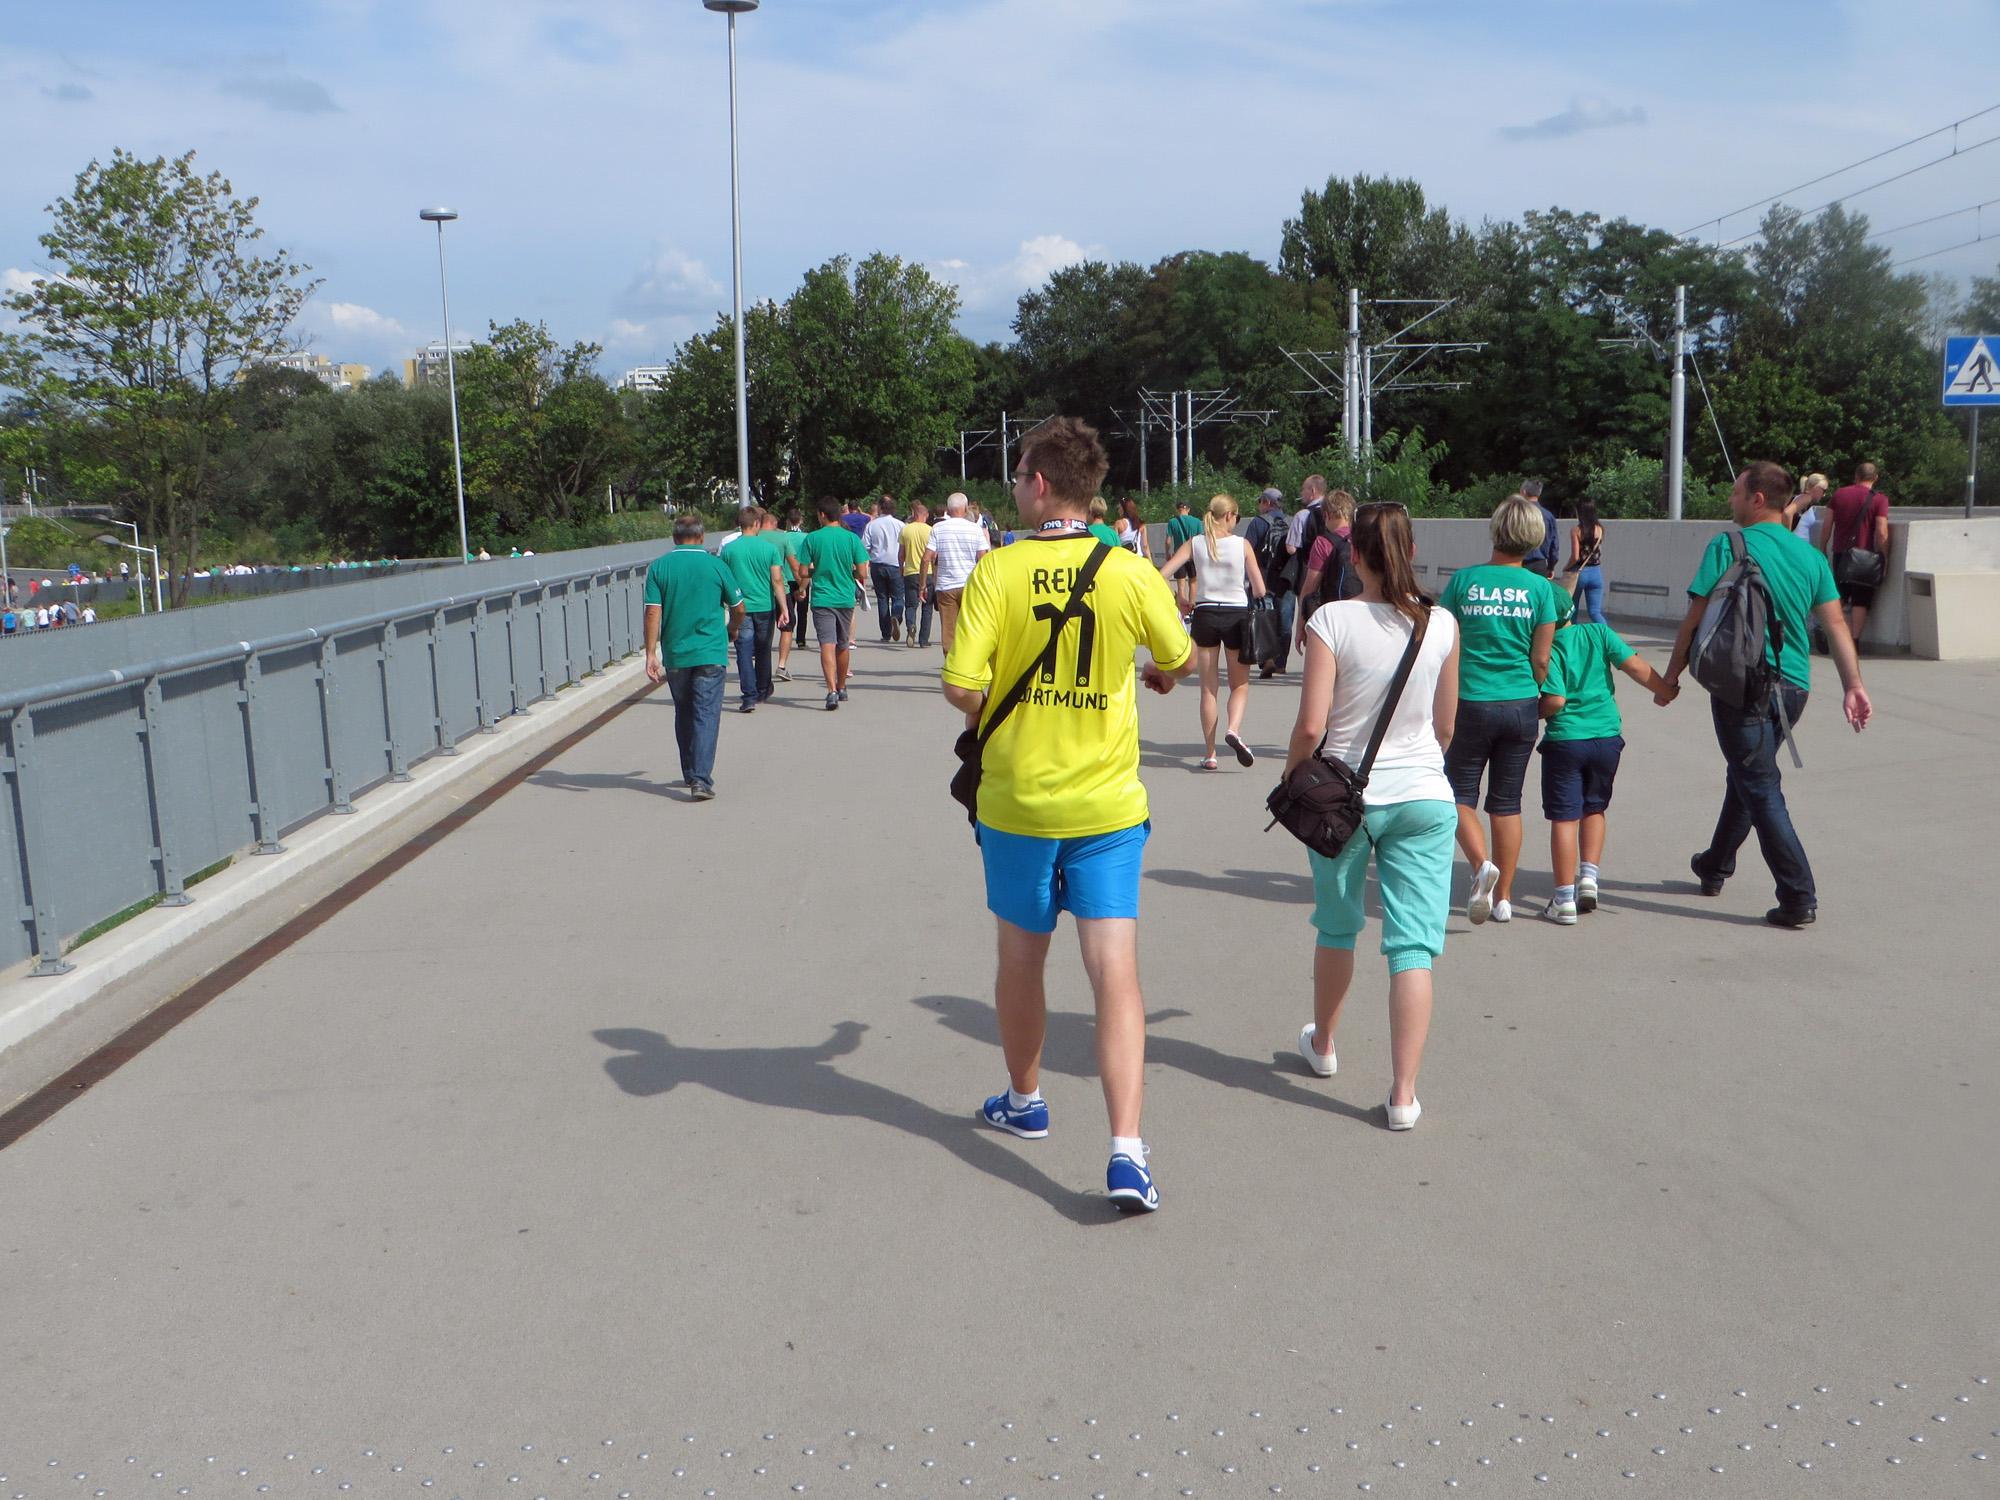 In Wroclaw - mit Reus Trikot